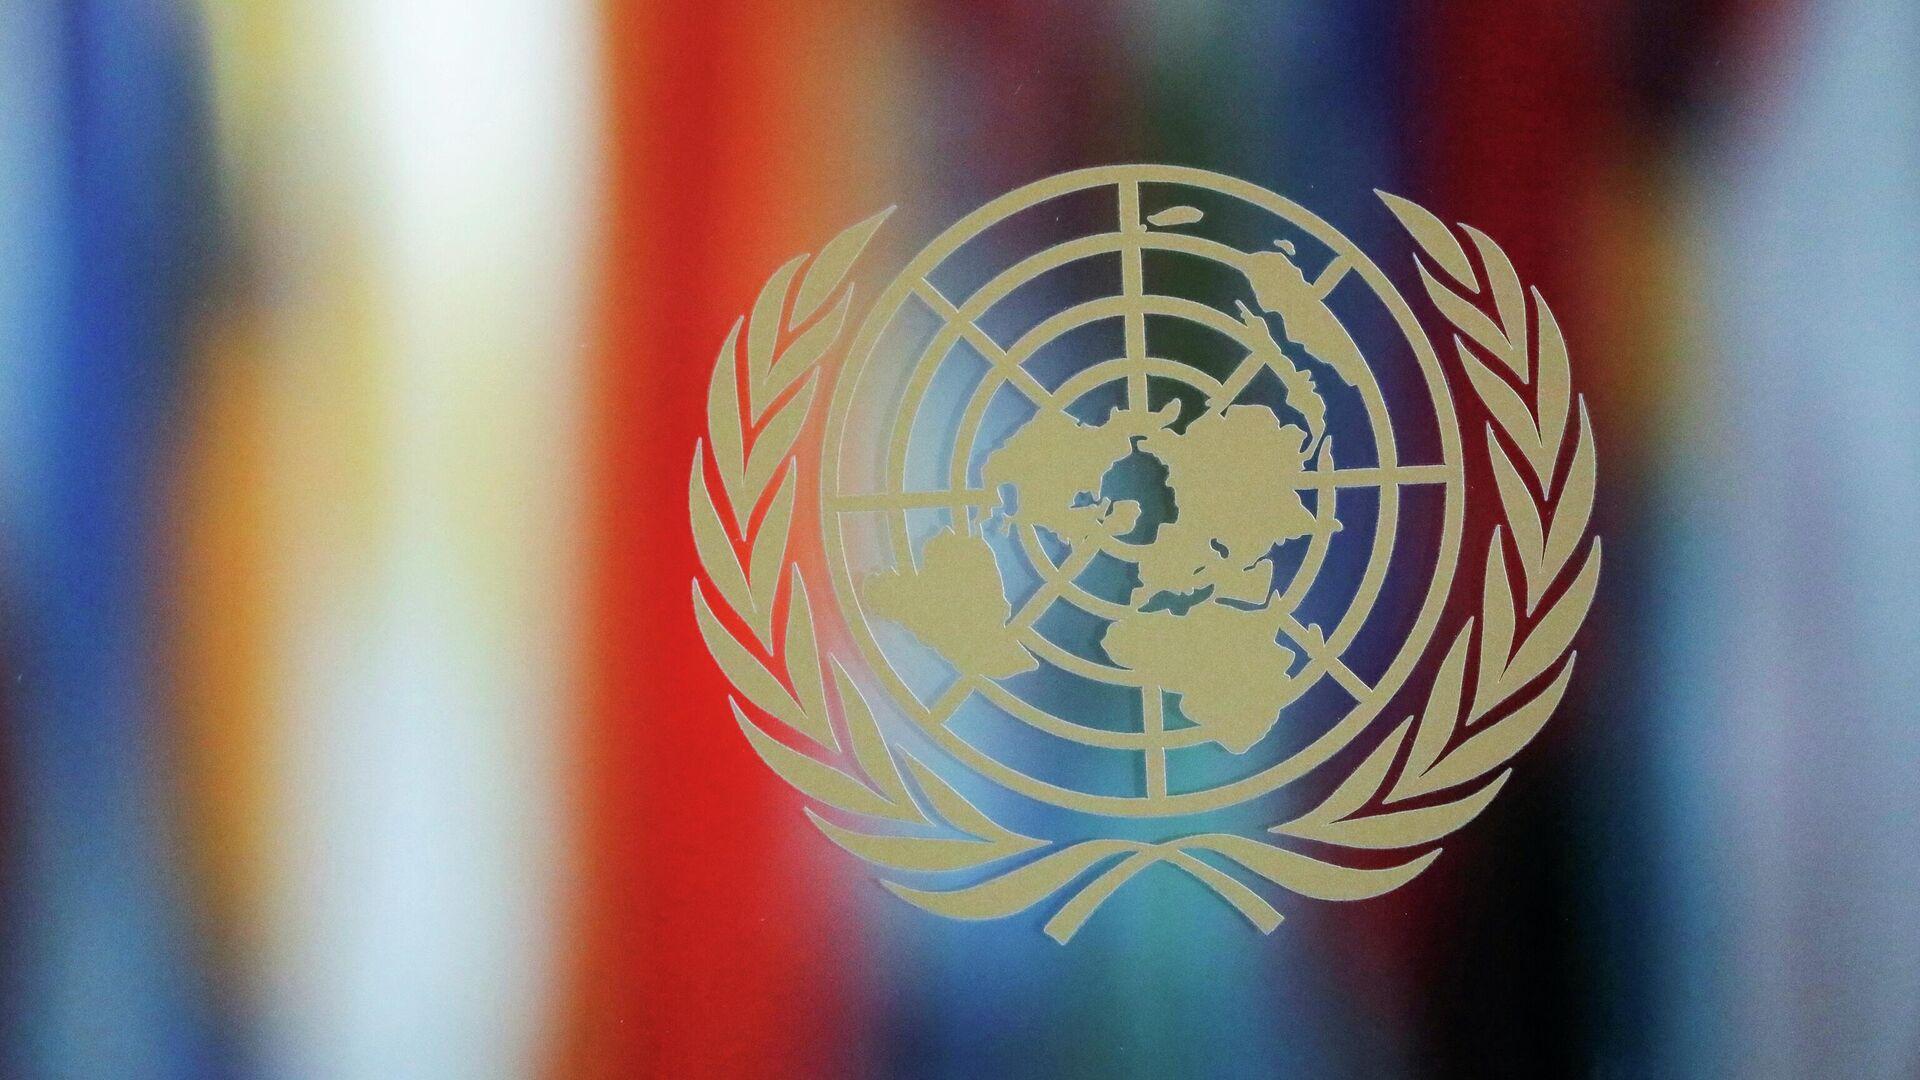 Logo de la ONU - Sputnik Mundo, 1920, 05.07.2021